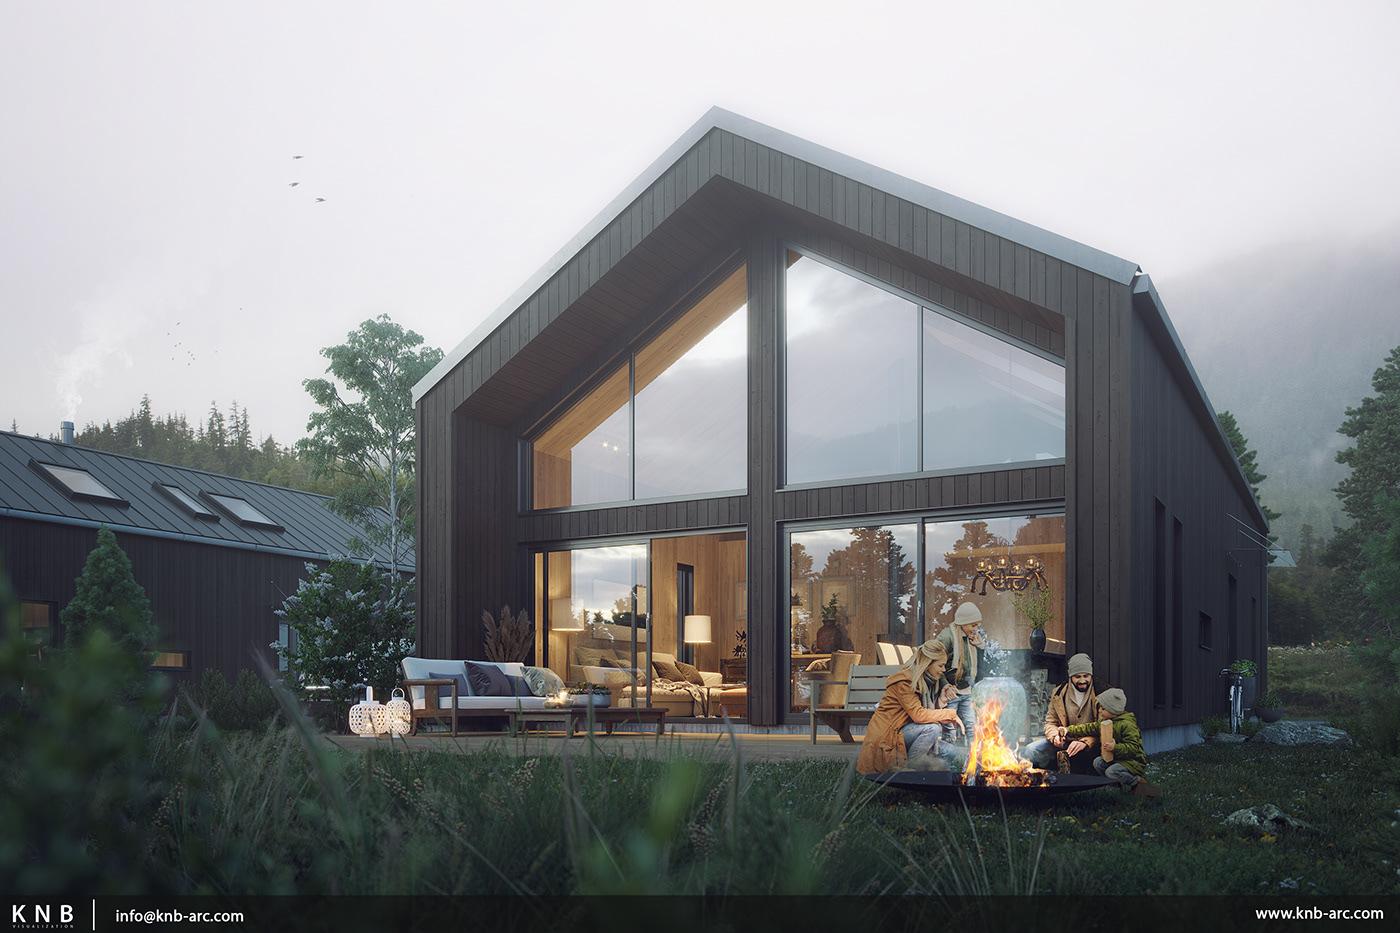 #render #cabin #exterior